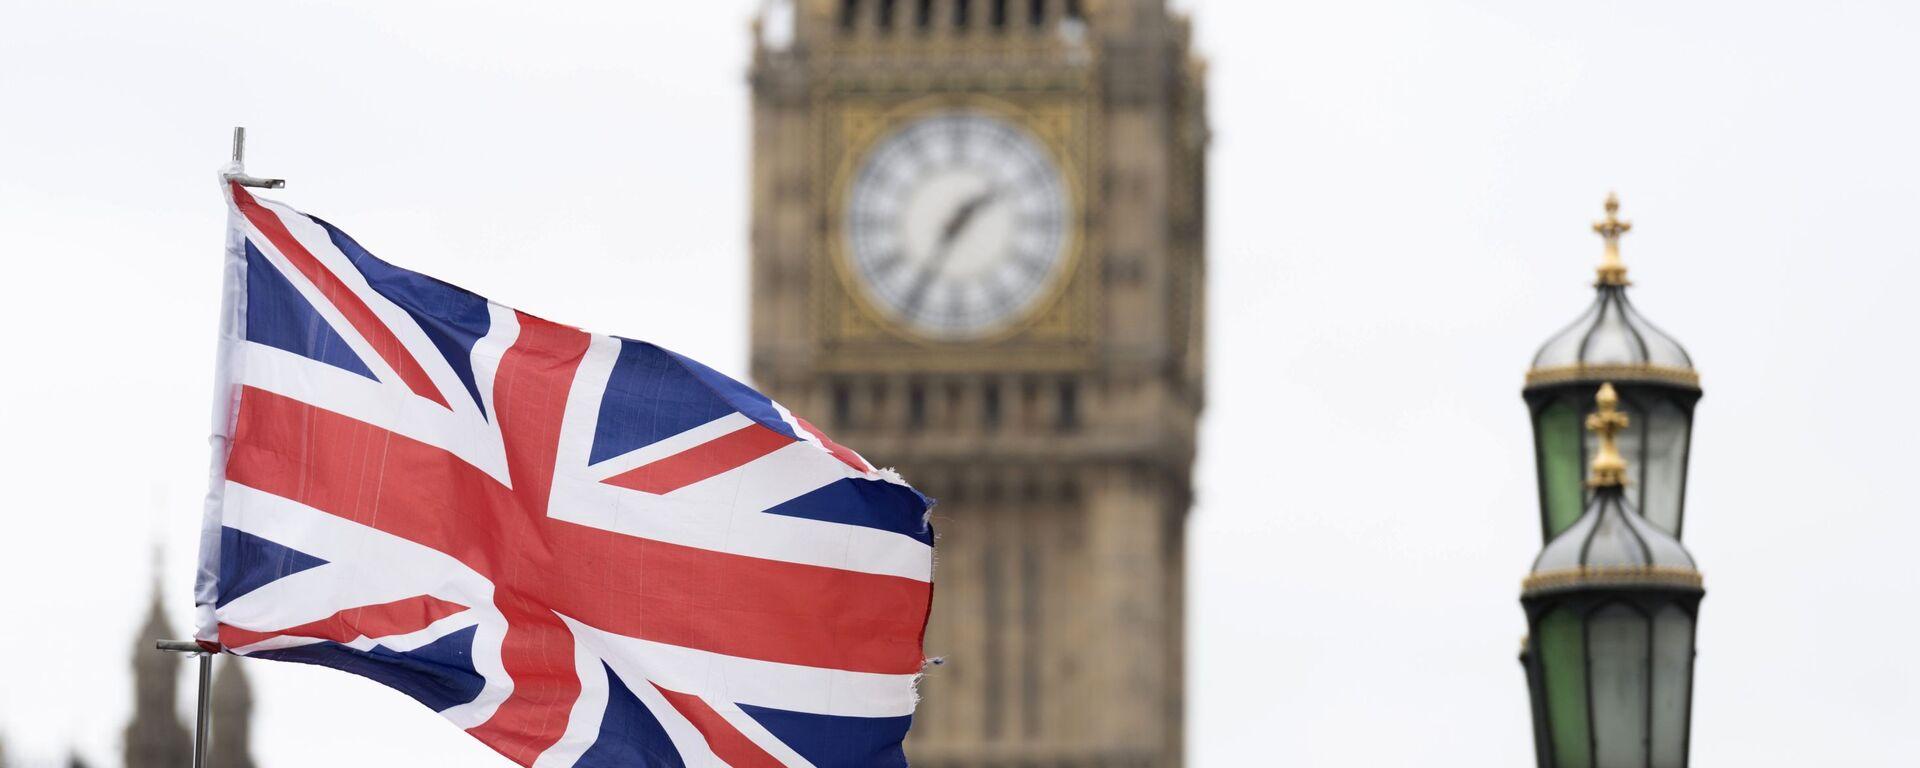 Флаг Великобритании на фоне Вестминстерского дворца в Лондоне - Sputnik Таджикистан, 1920, 21.03.2021